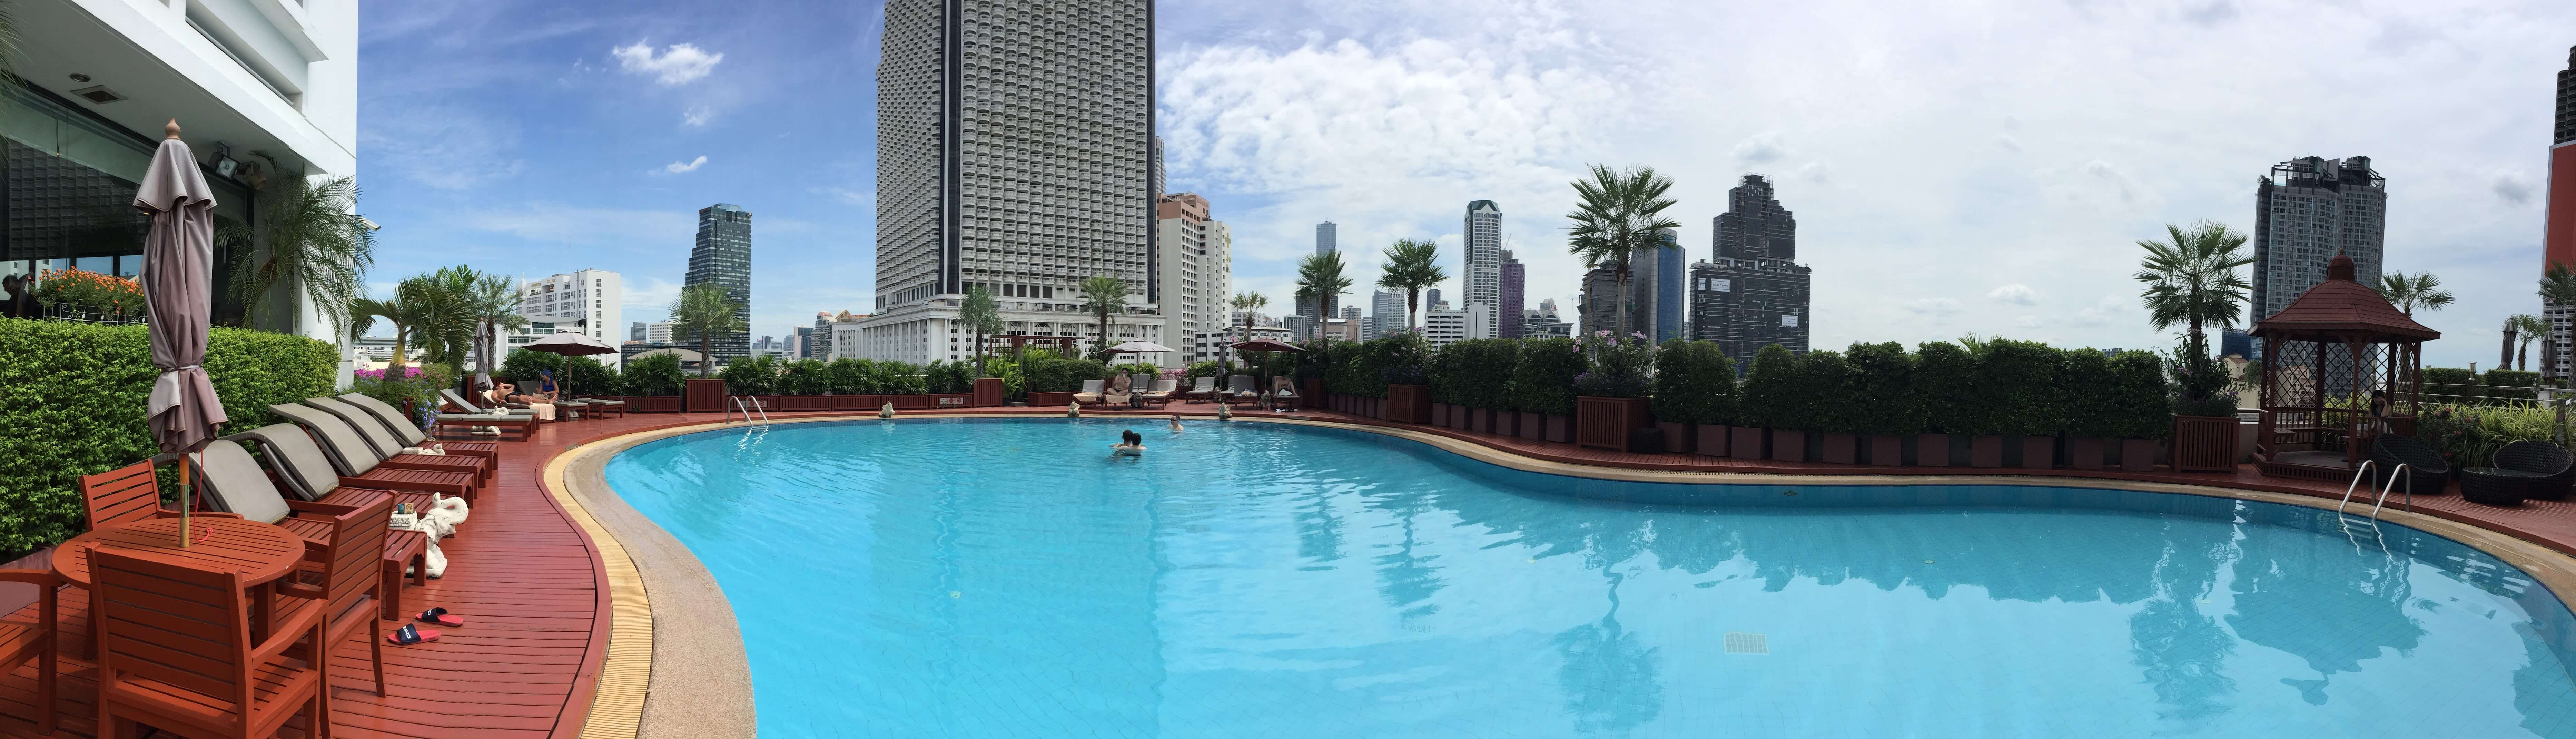 Centre Point Hotel Silom 游泳池。